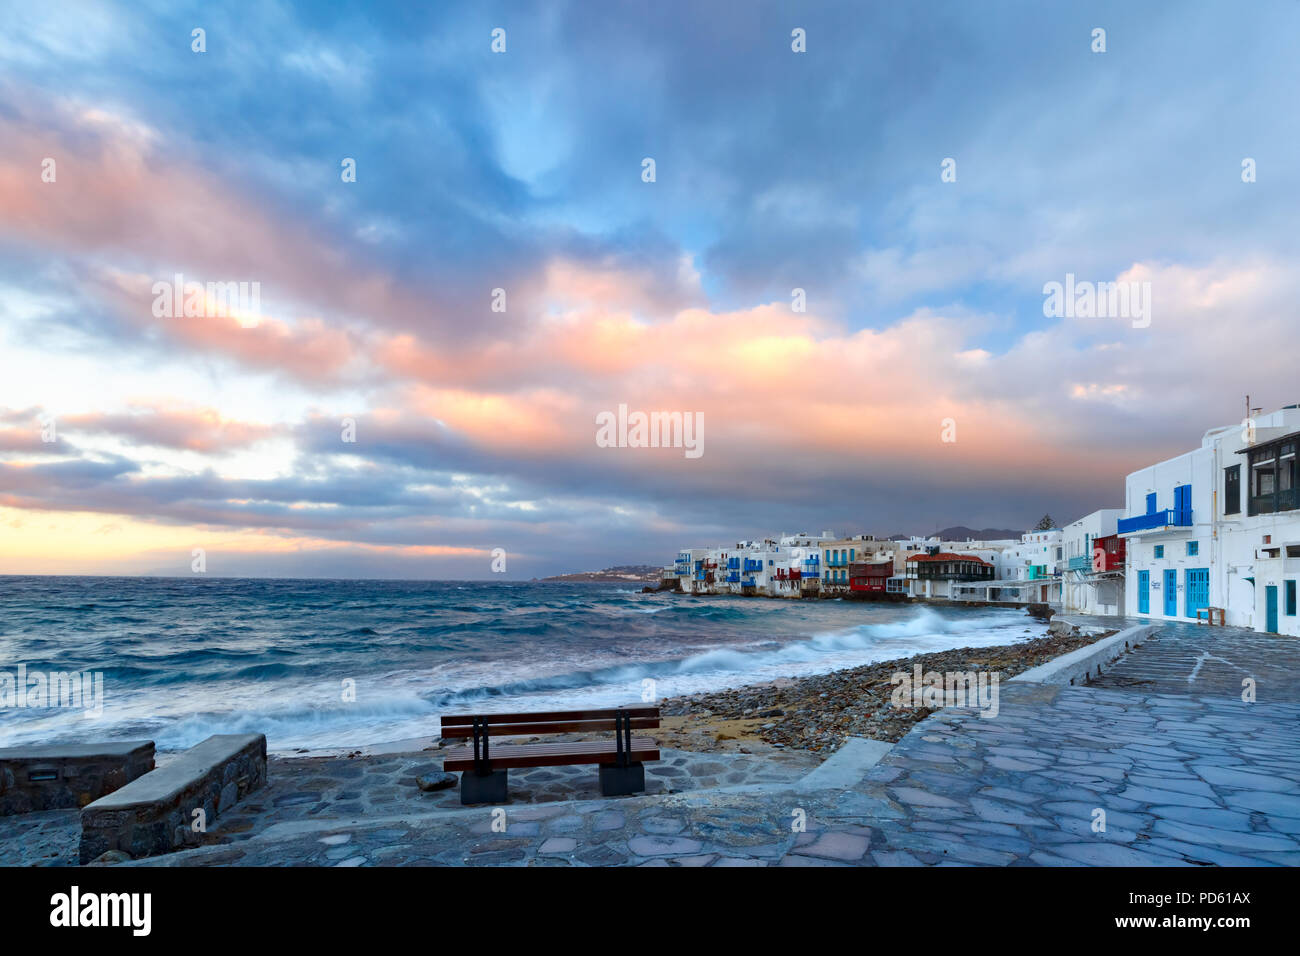 Little Venice on island Mykonos, Greece Stock Photo